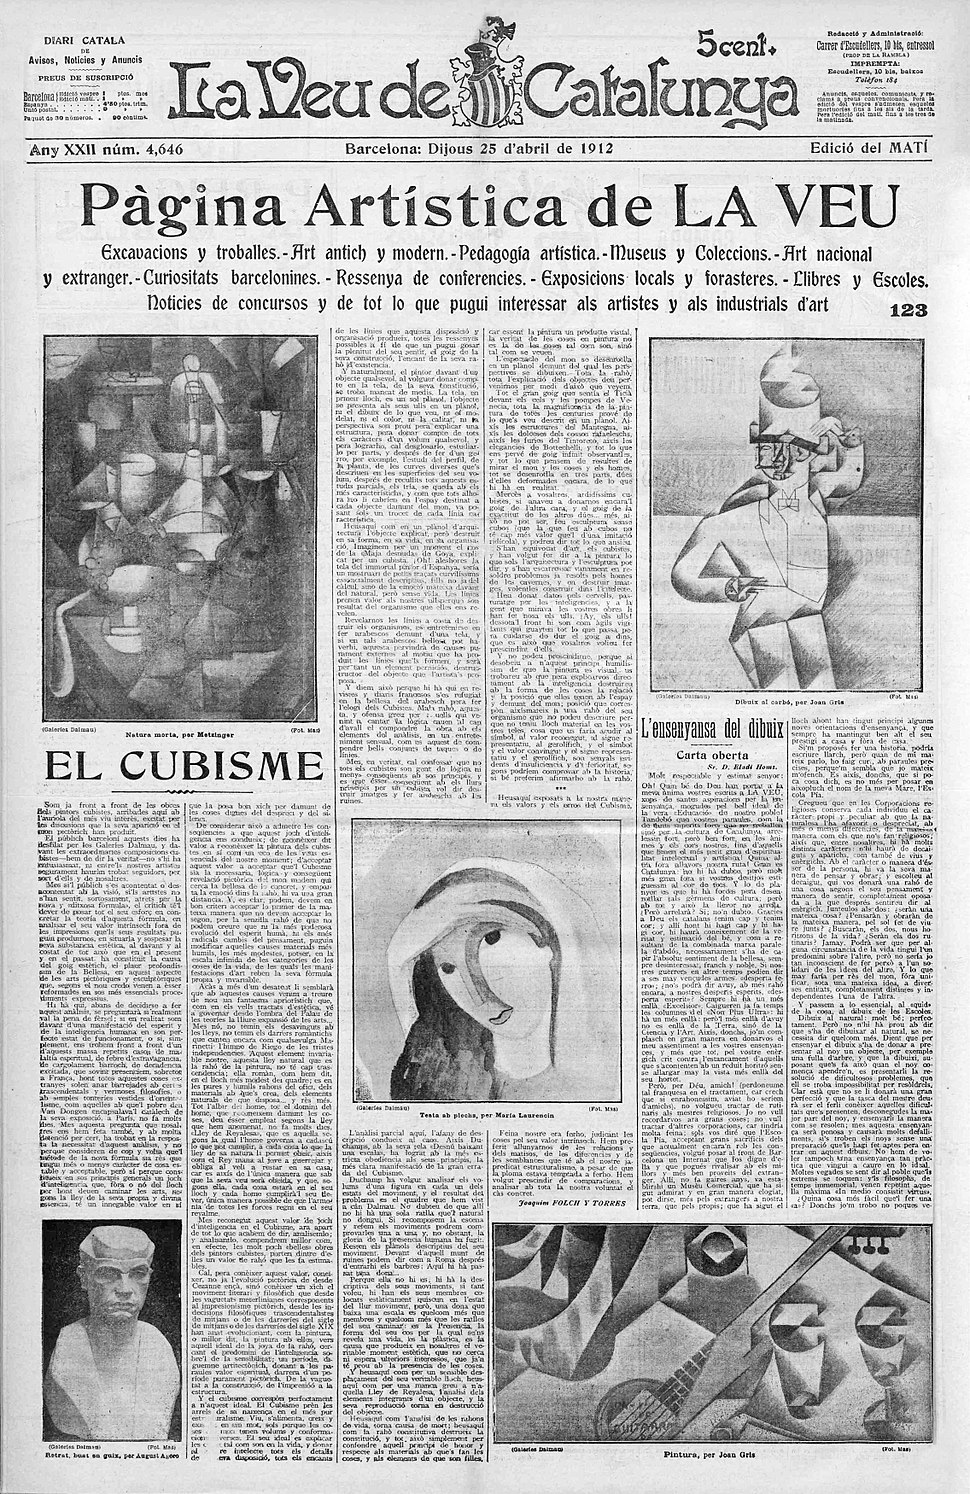 Jean Metzinger, Juan Gris, Marie Laurencin, August Agero, Veu de Catalunya, 25 April 1912